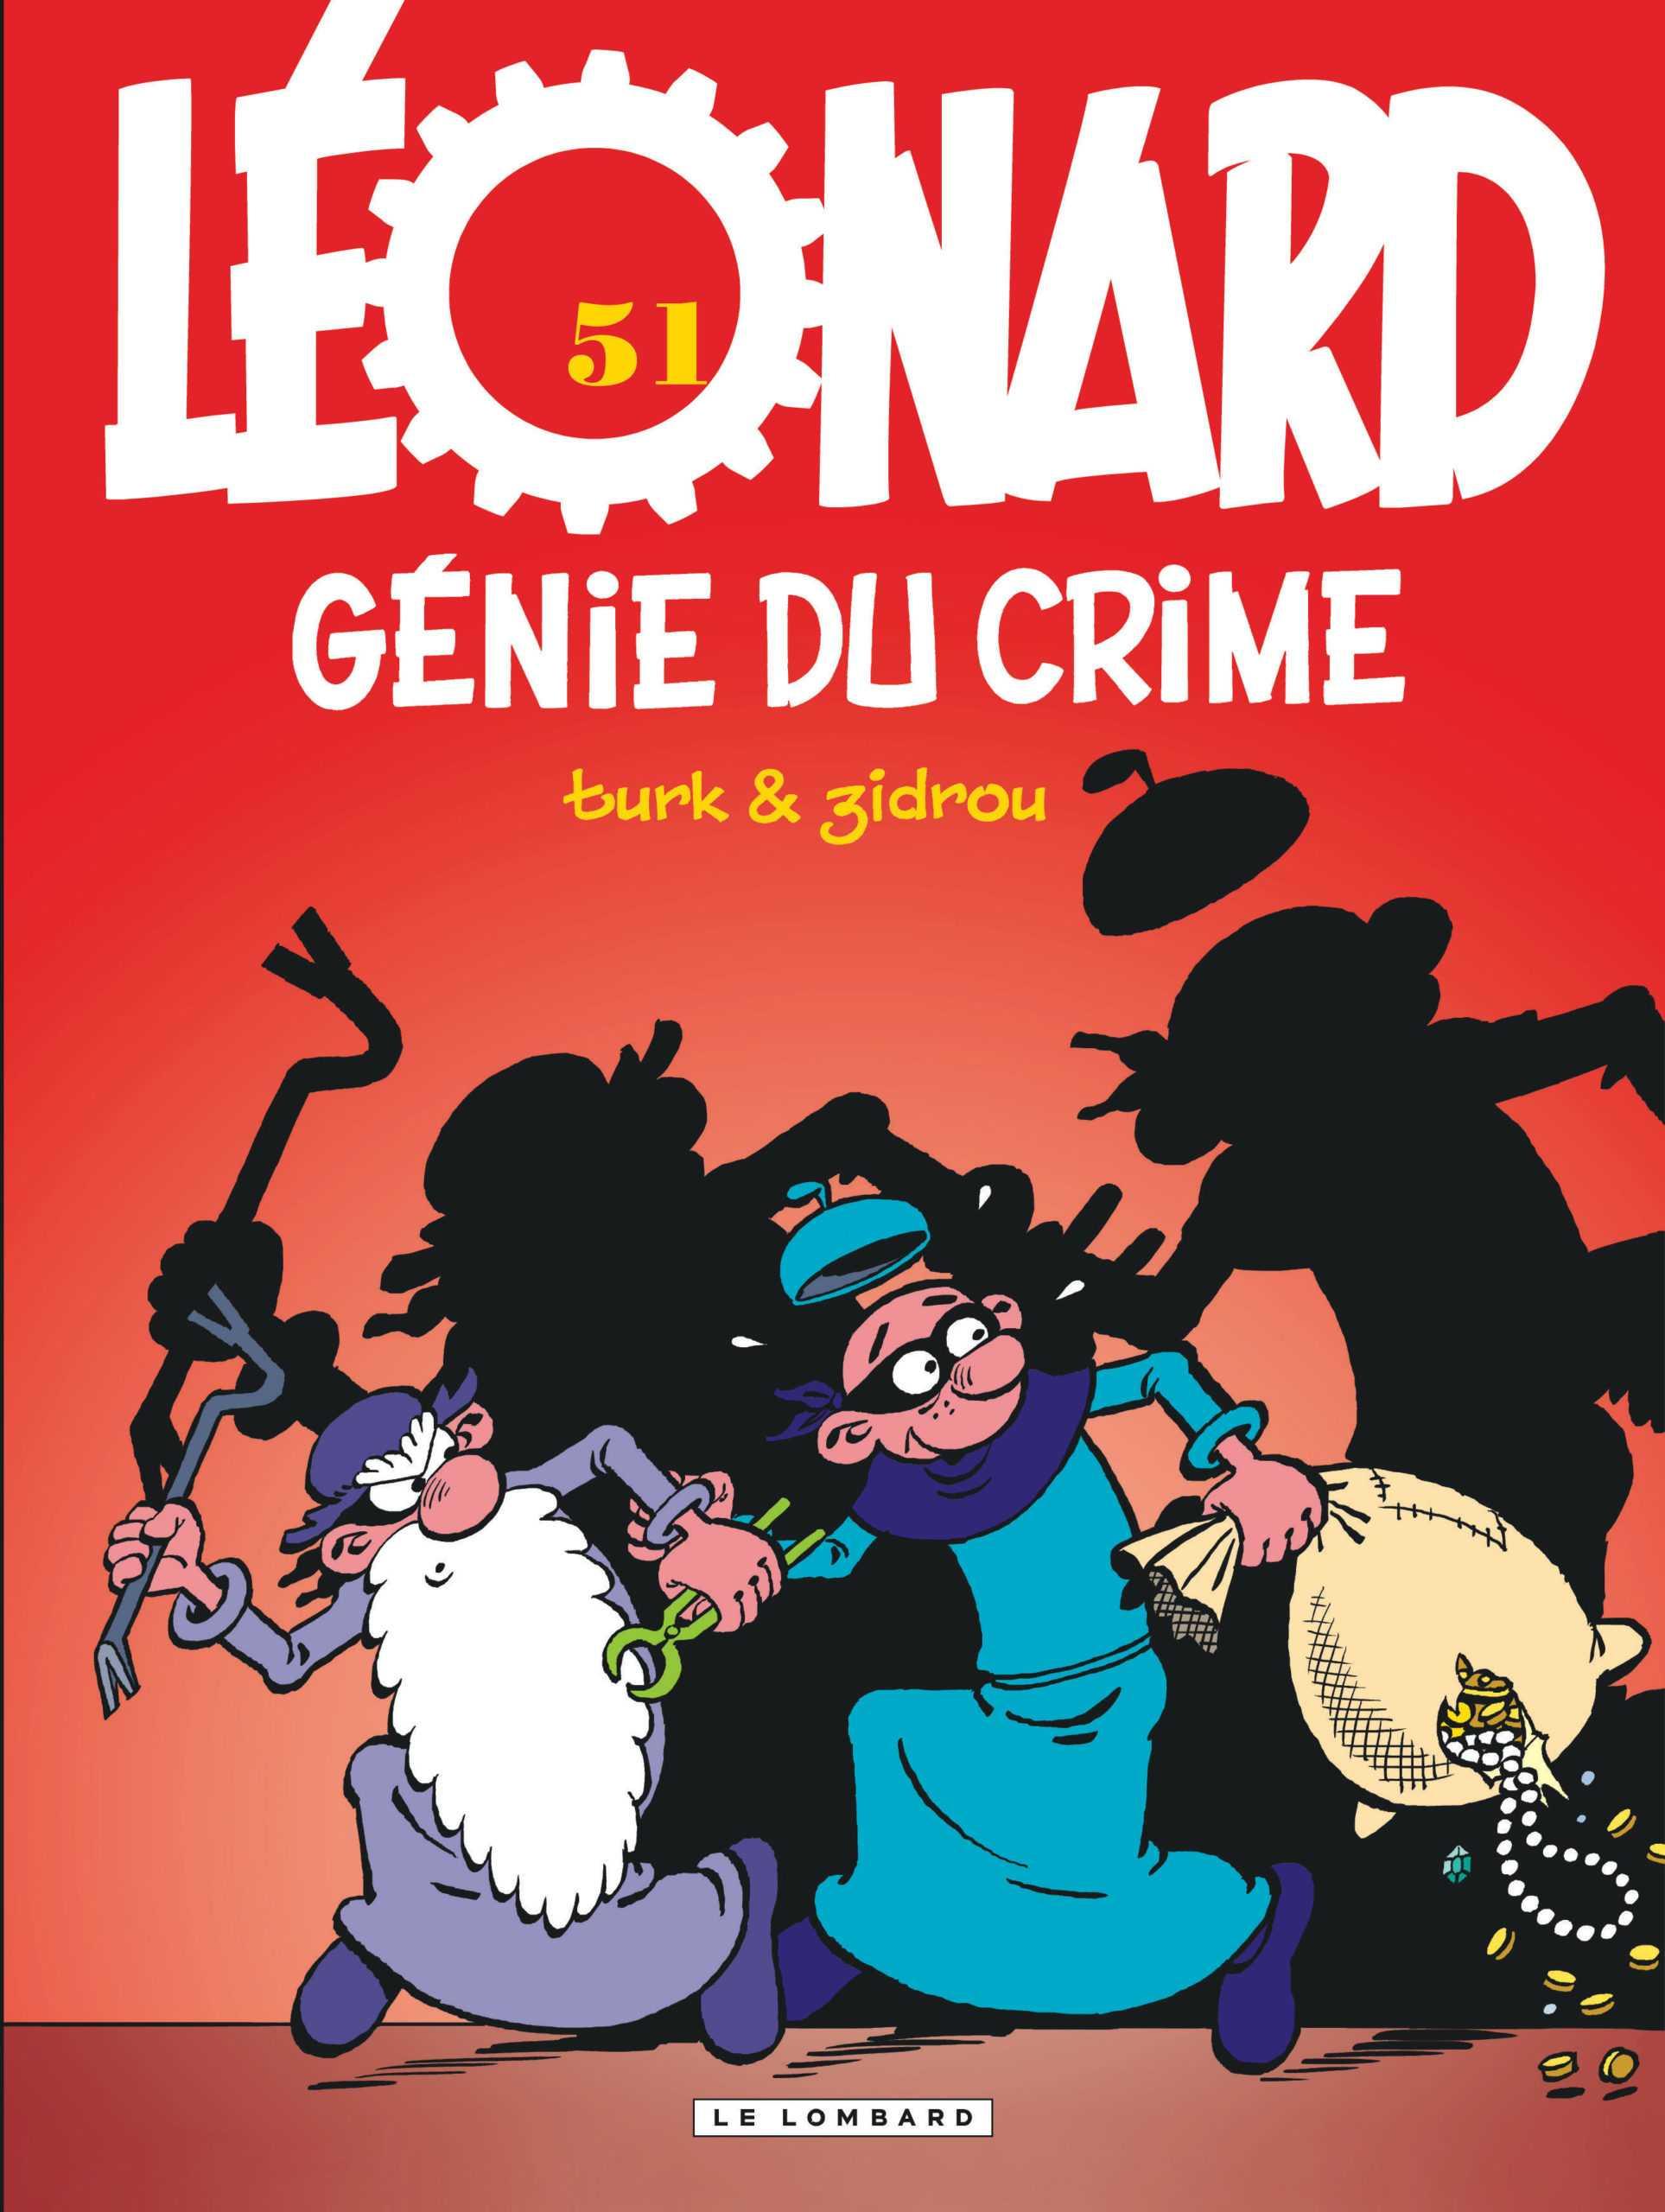 Léonard T51, un génie maffieux